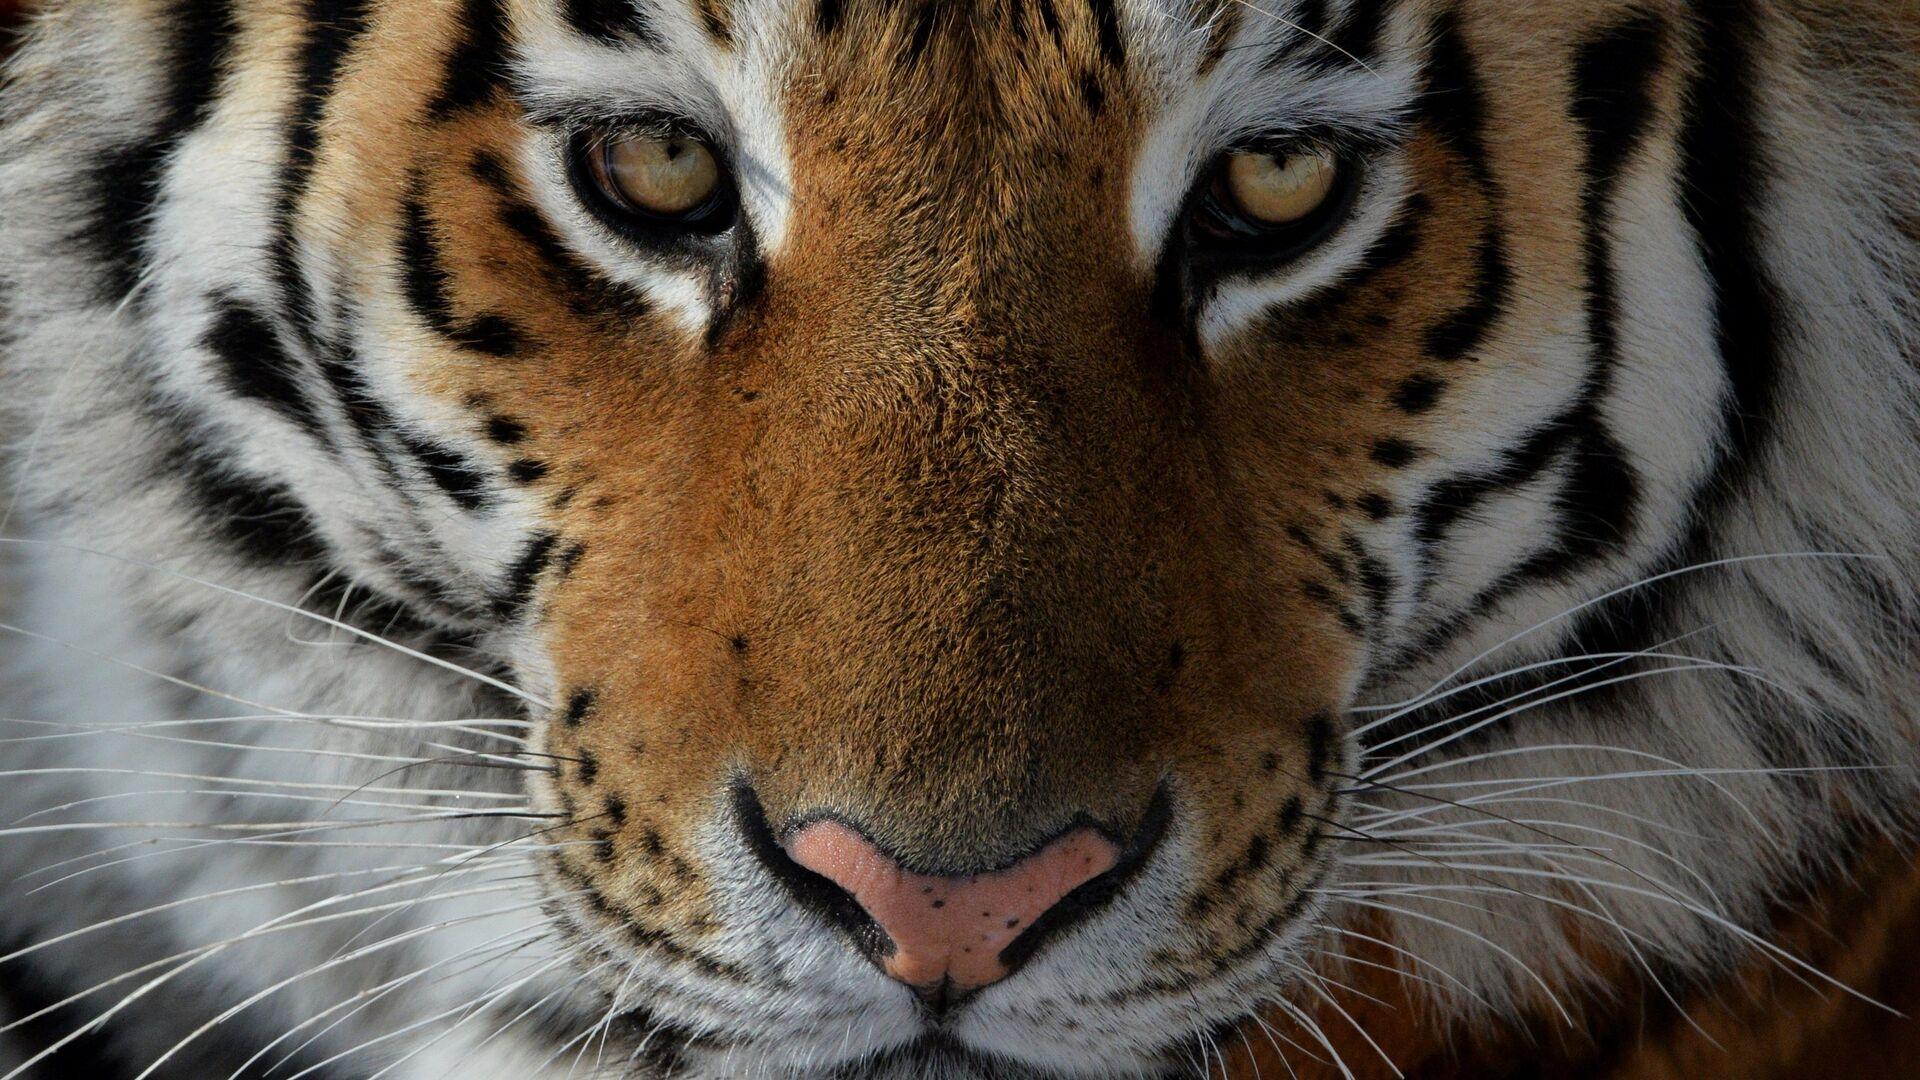 Un tigre (imagen referencial) - Sputnik Mundo, 1920, 27.09.2021